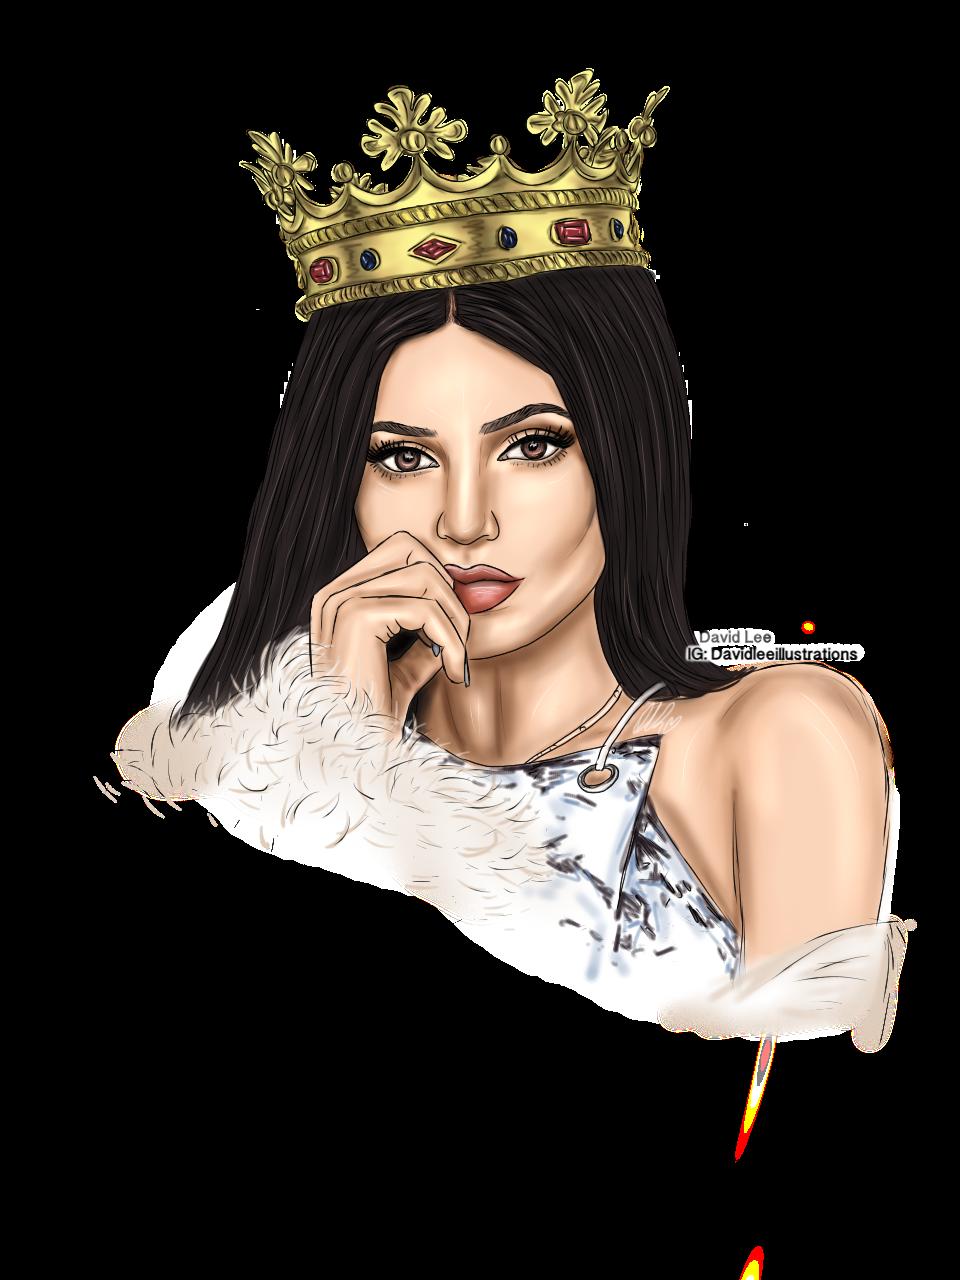 Kylie Jenner By David Lee Illustrations #KylieJenner